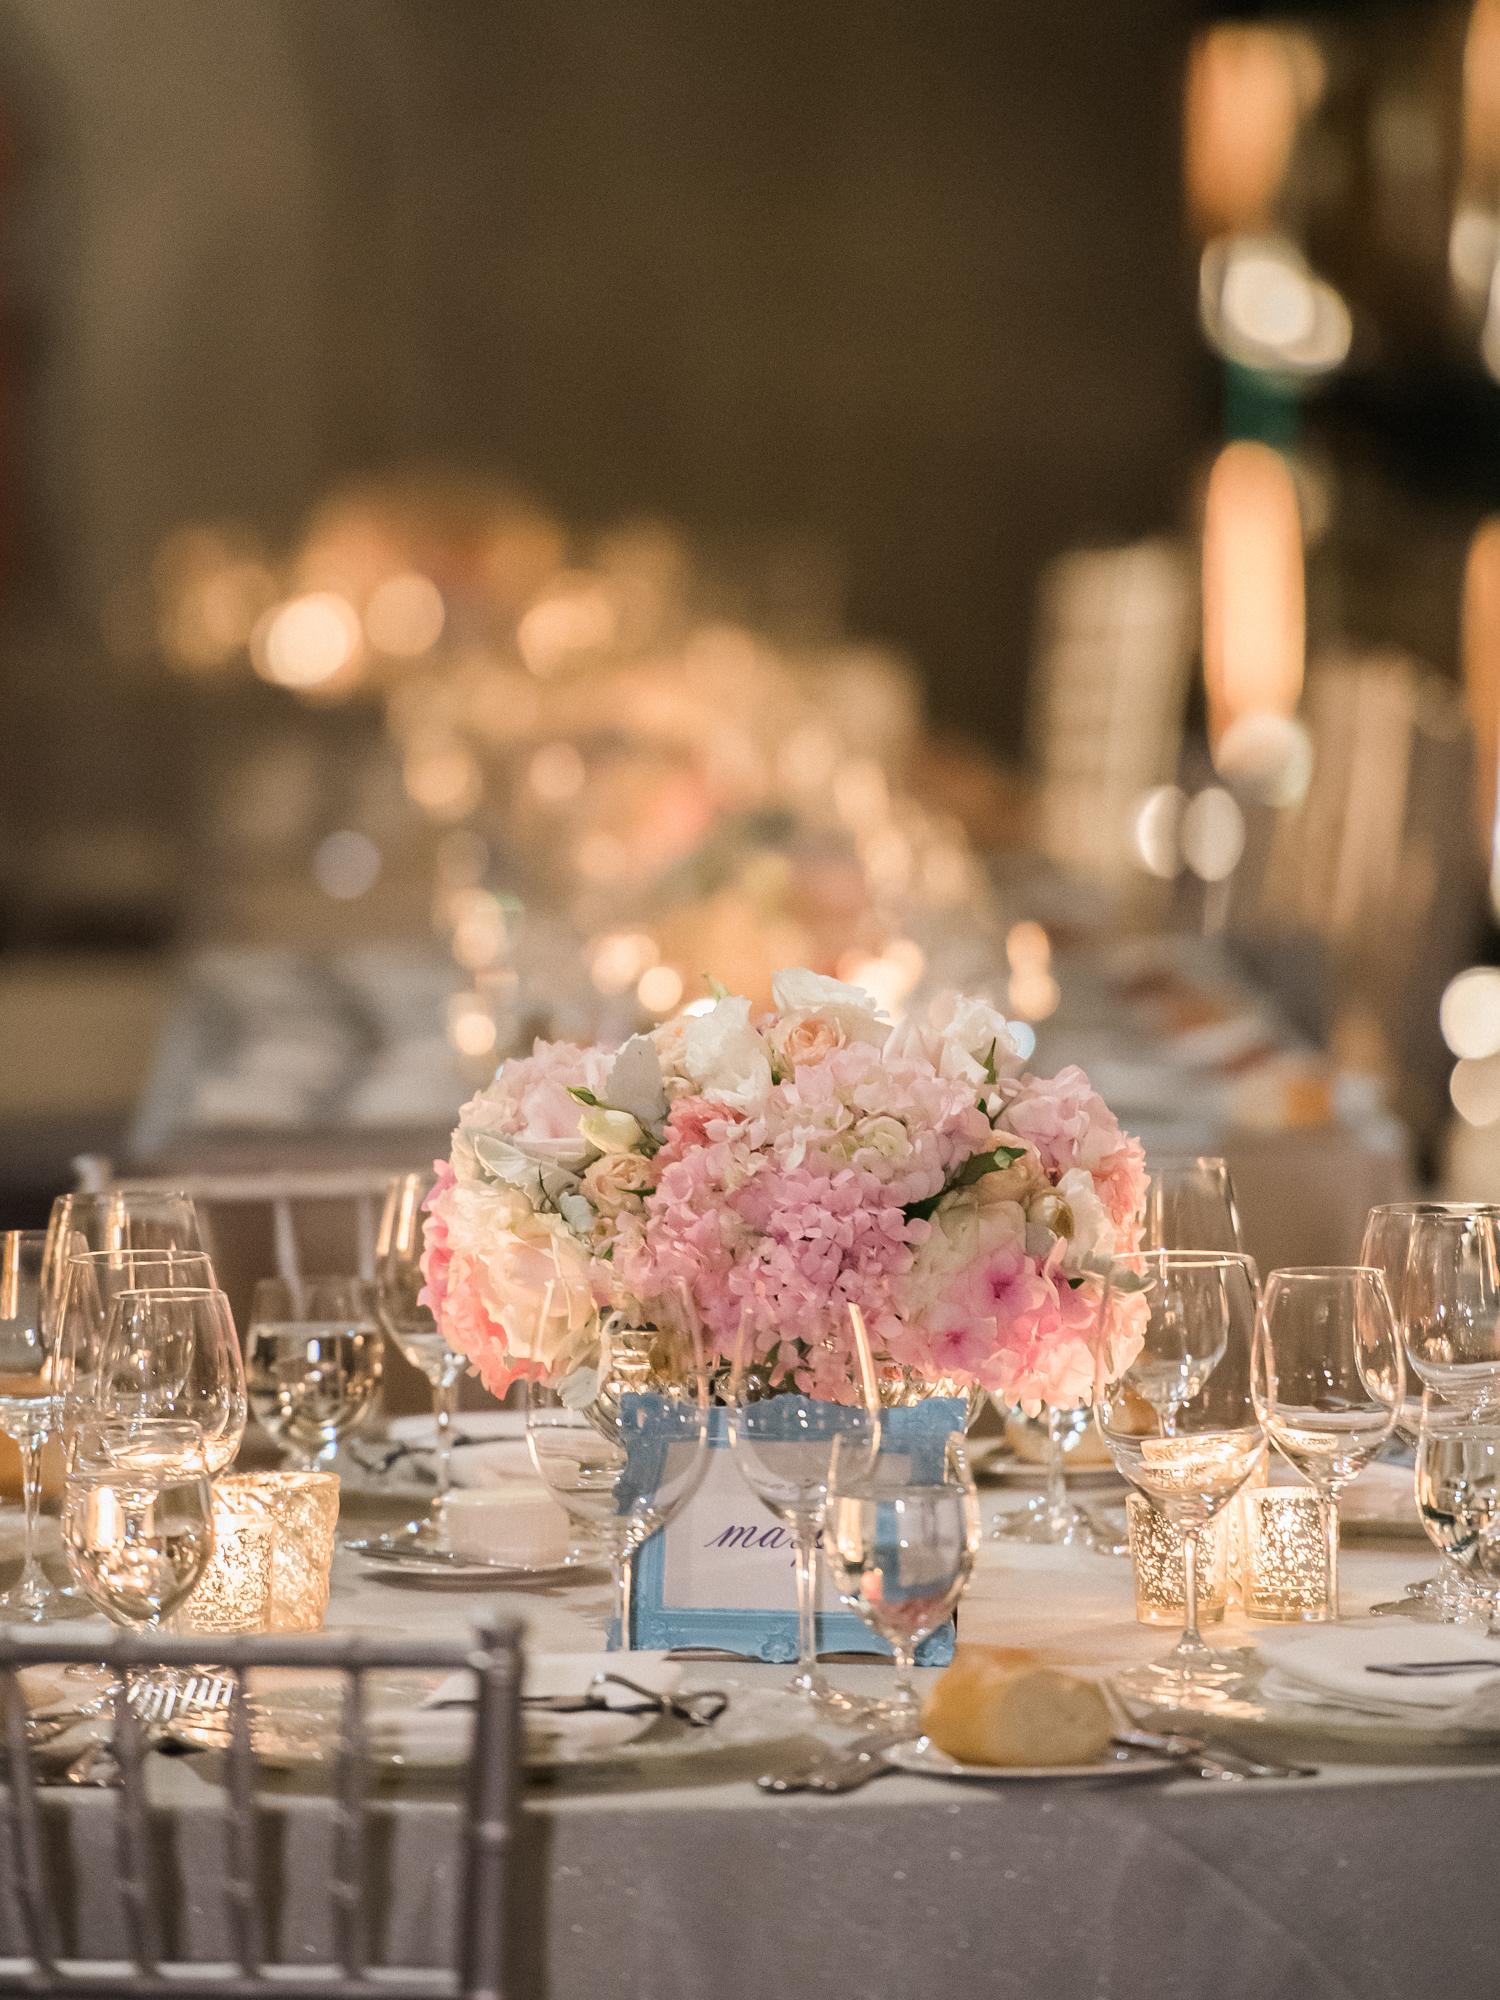 Aimee+Logan_wedding_spp-145.jpg